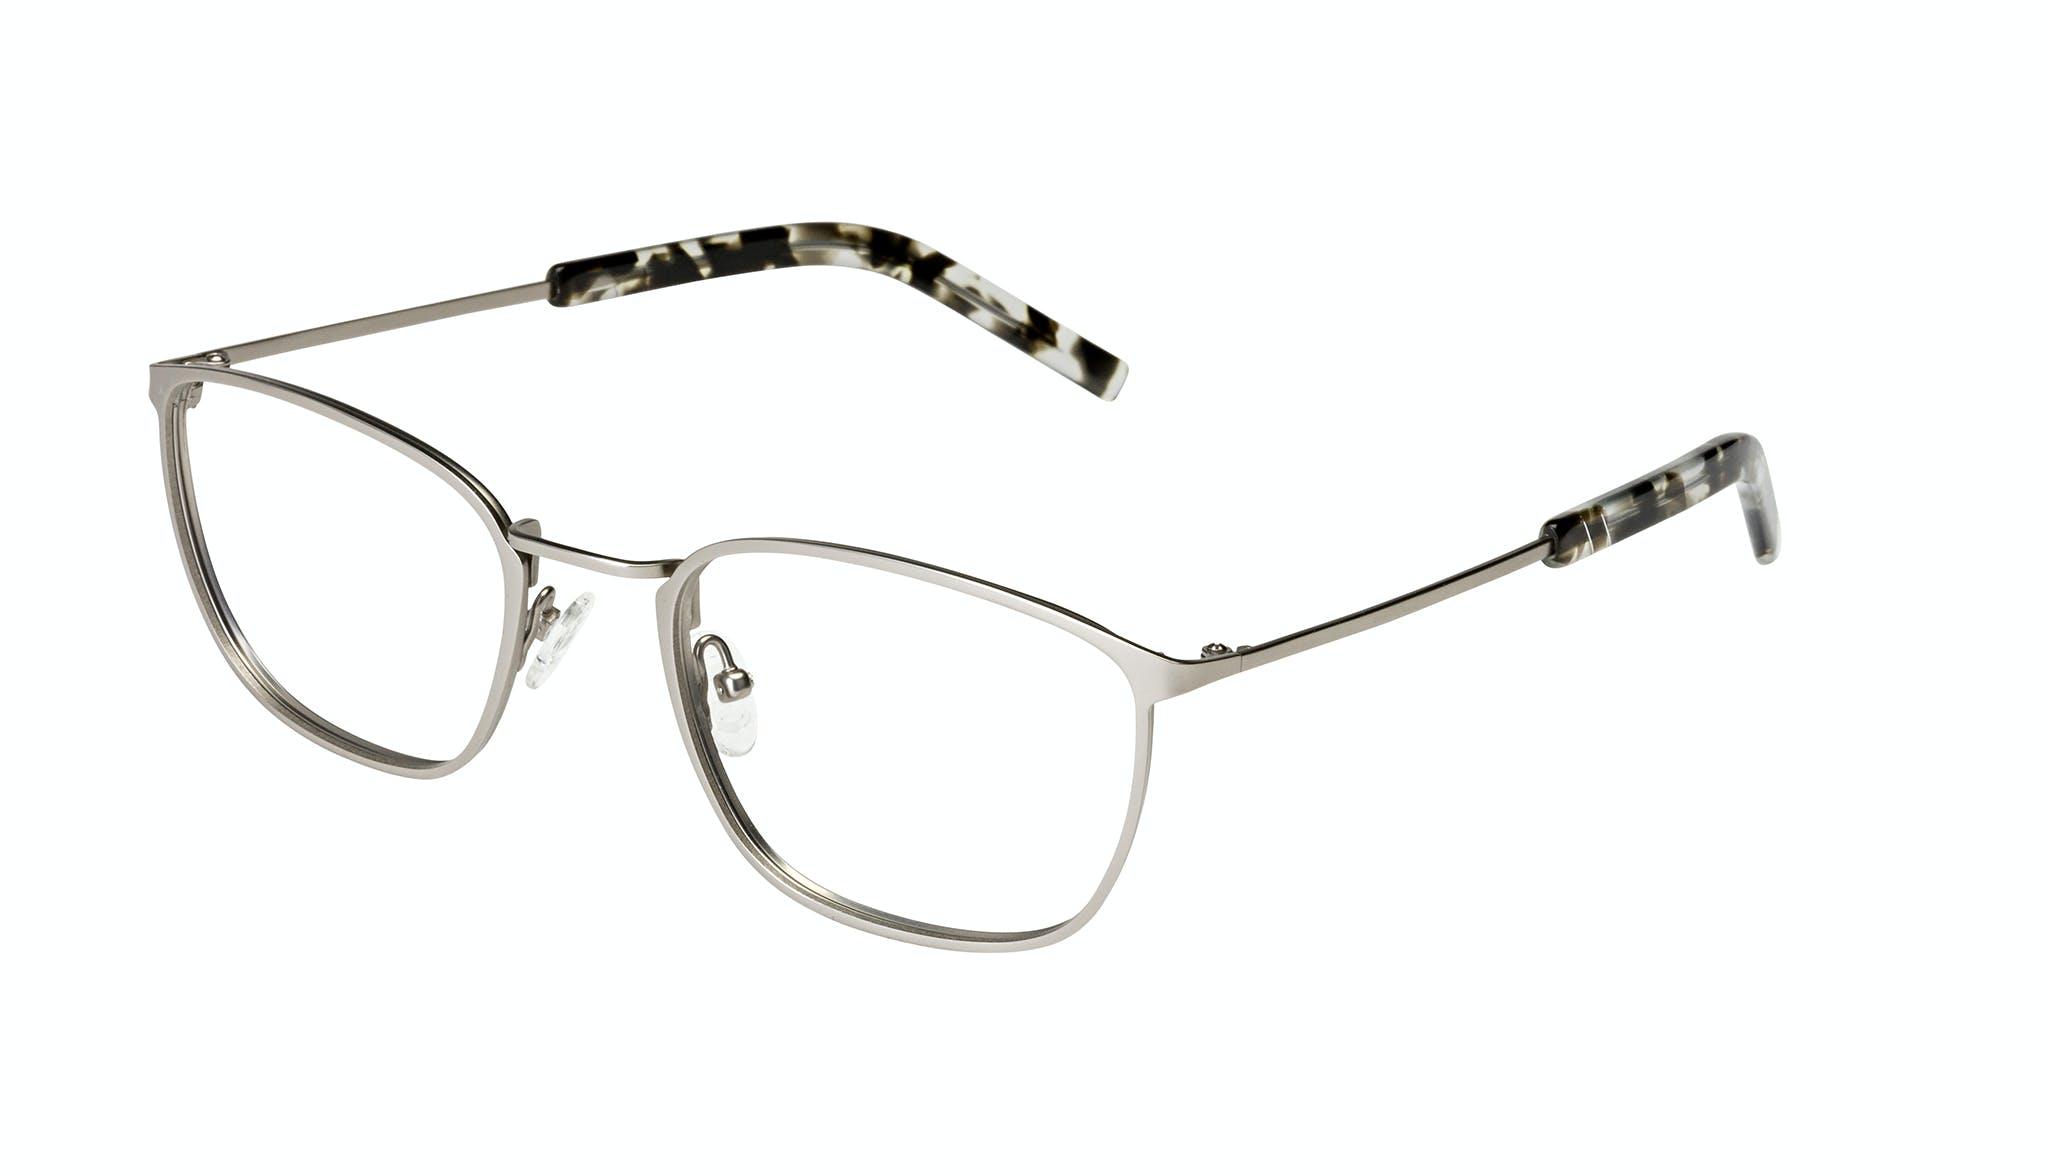 Affordable Fashion Glasses Rectangle Eyeglasses Men Edge Silver Tilt